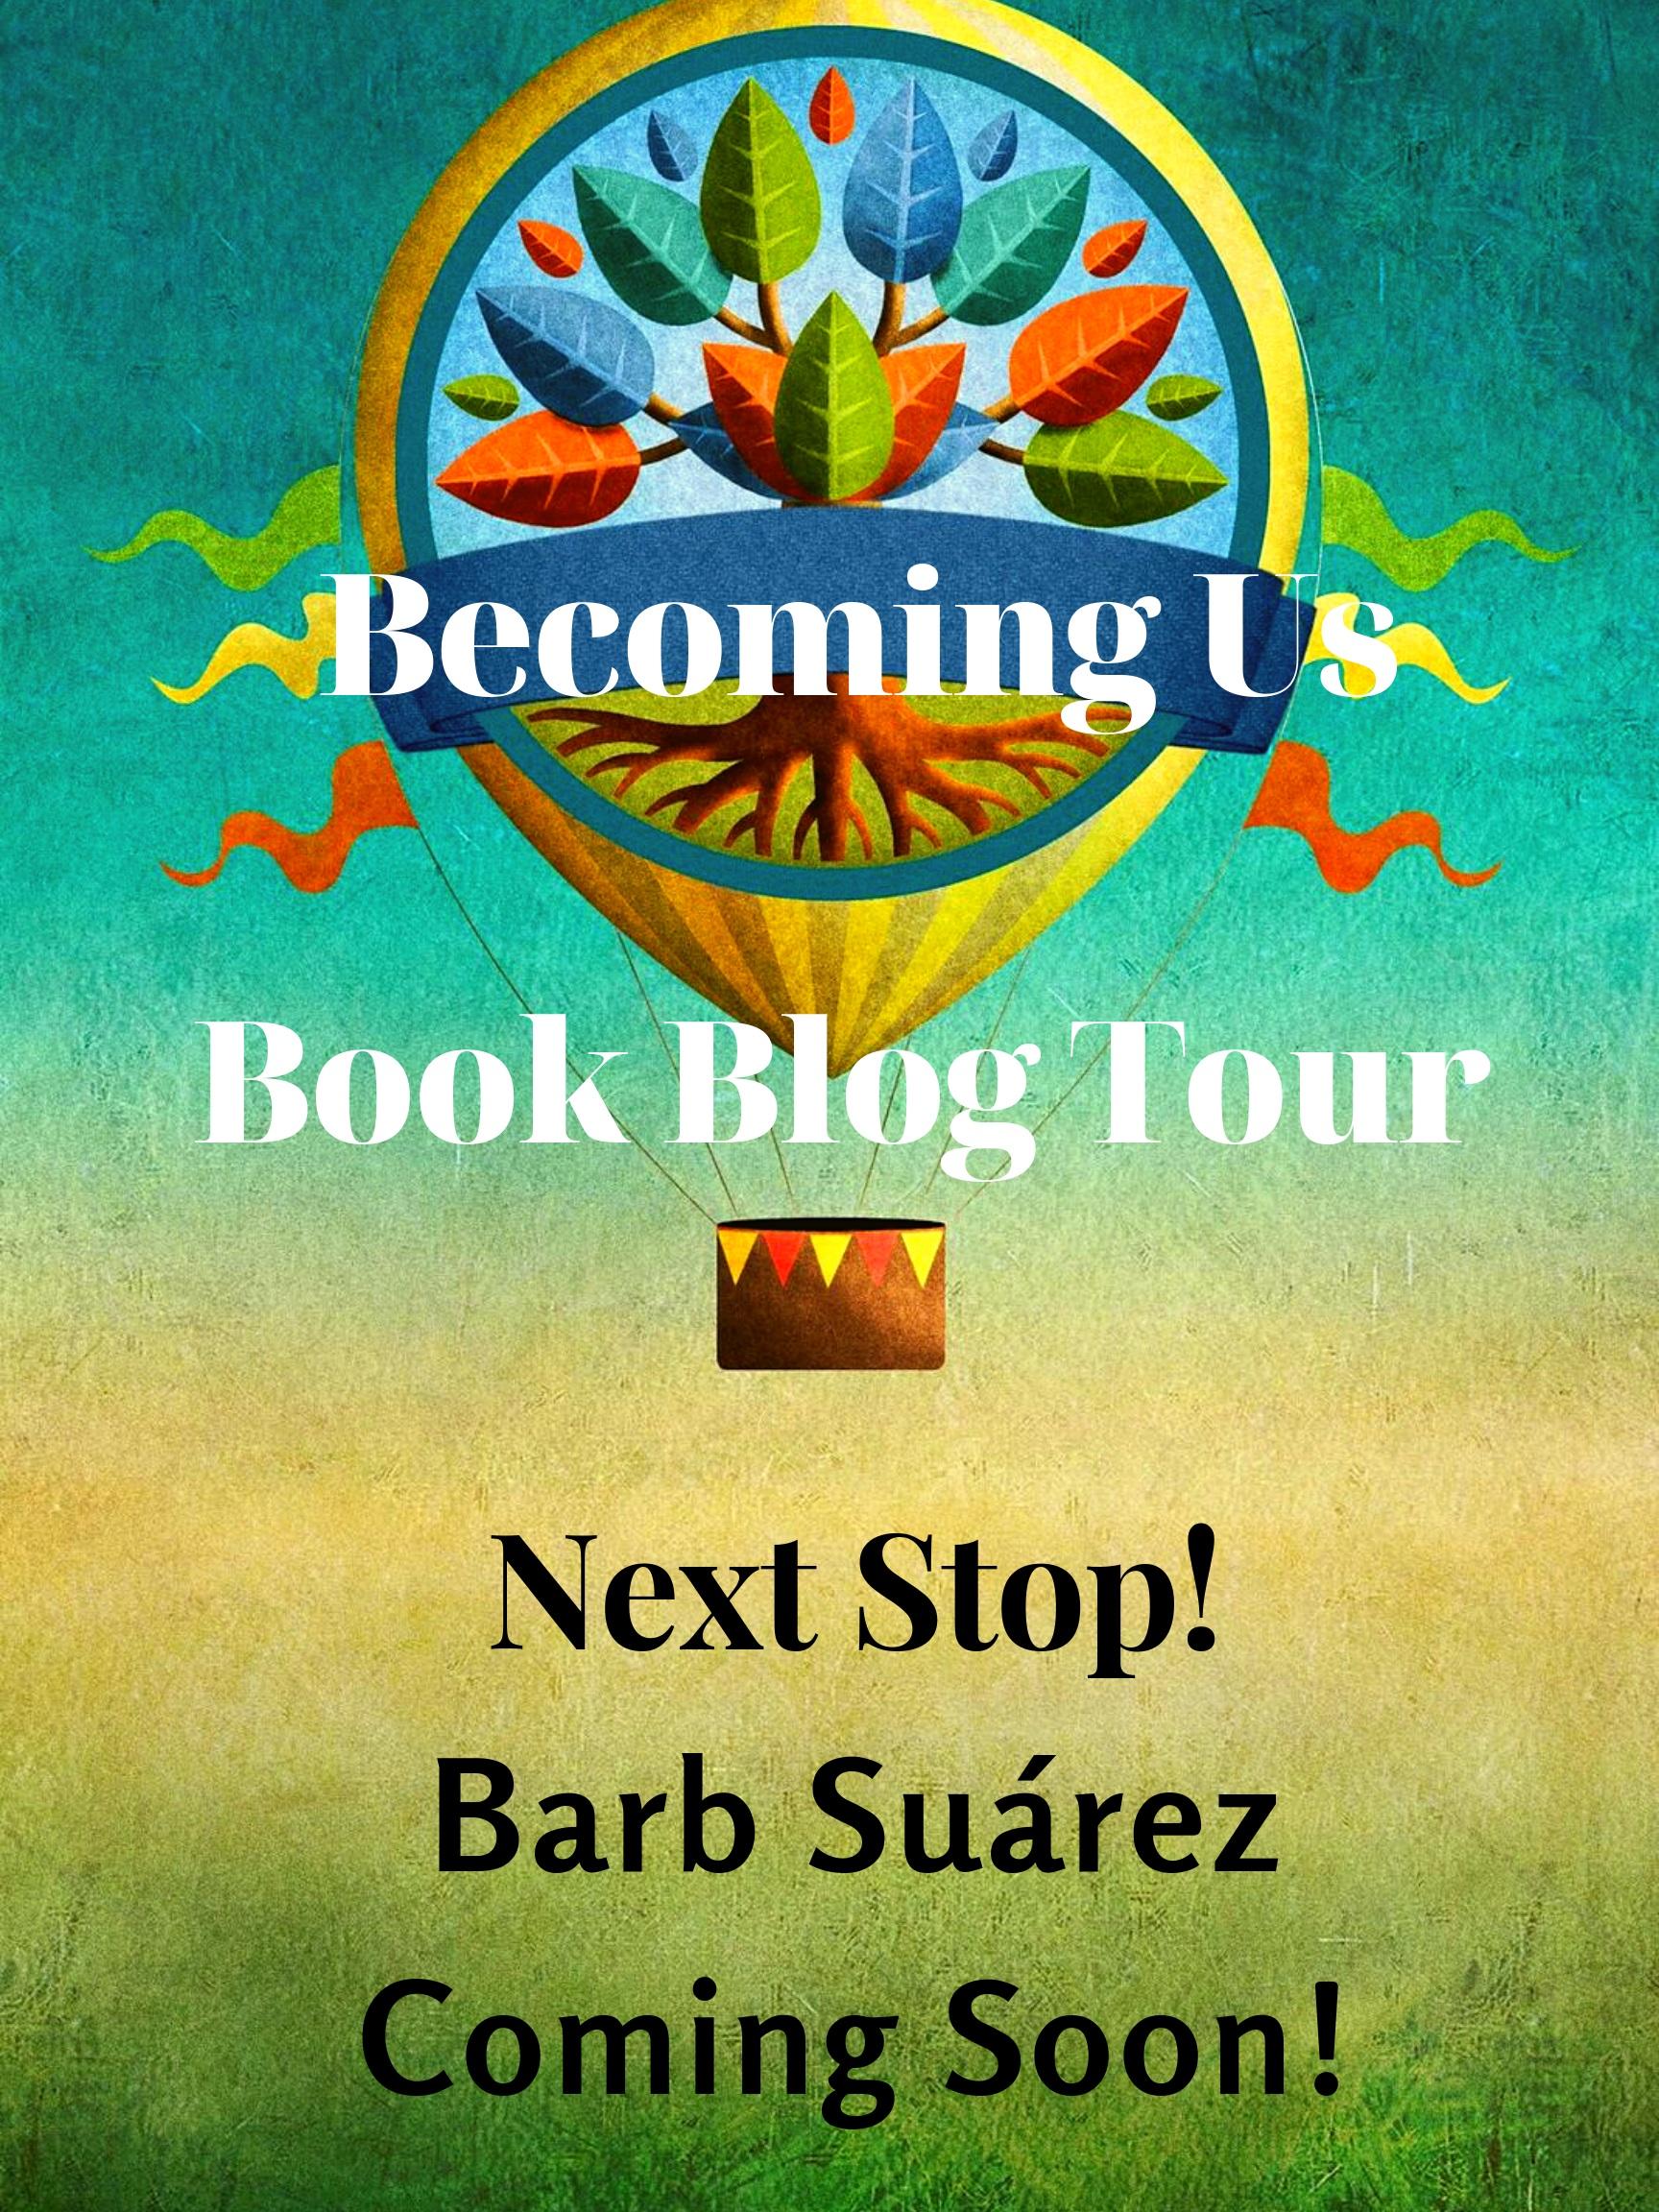 Becoming+Us+Blog+Tour+-+Barb.jpg